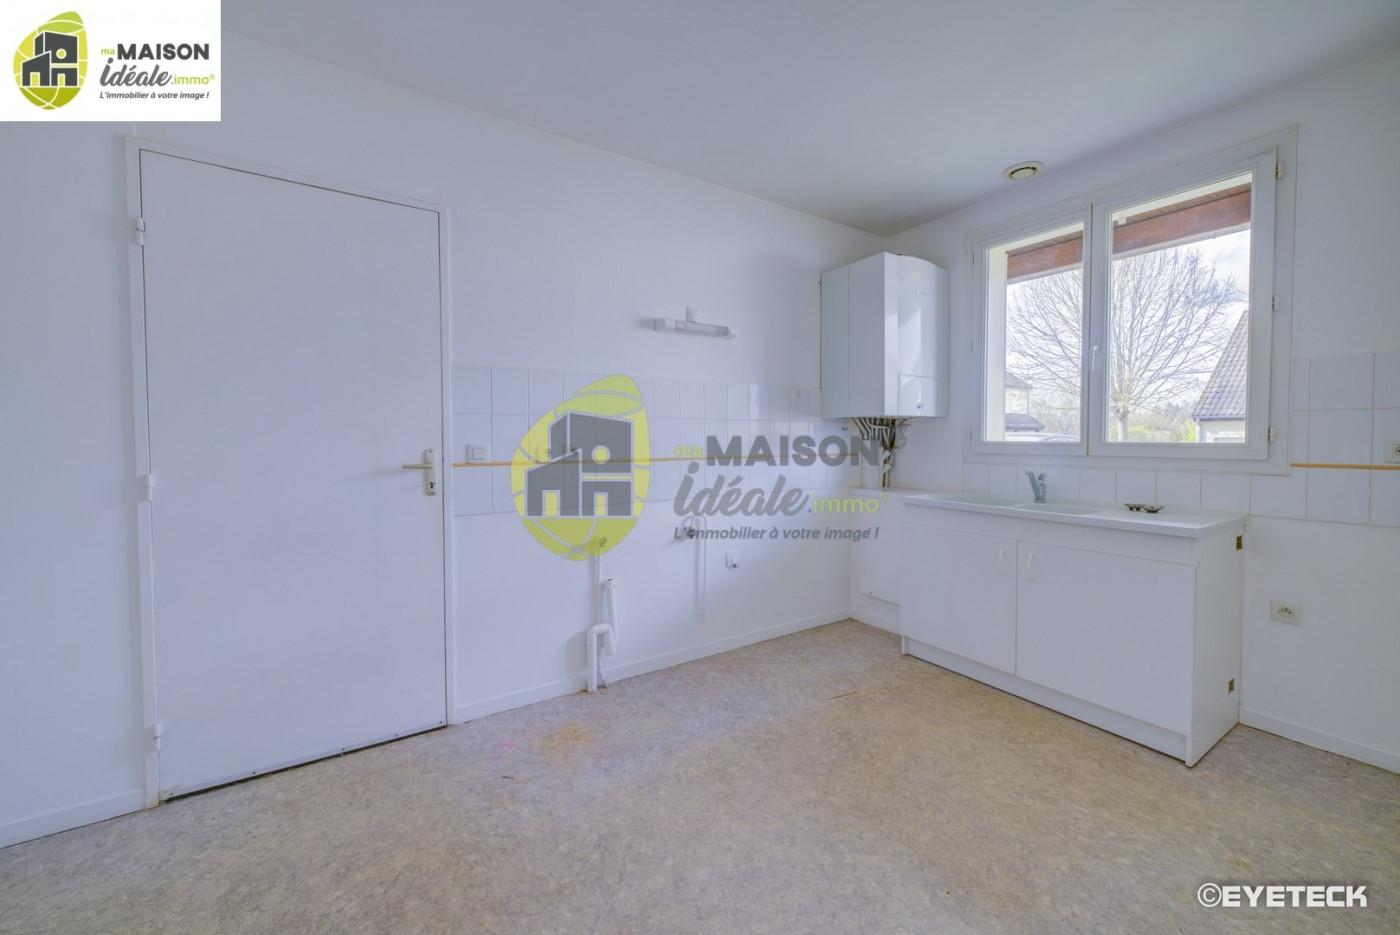 A vendre  Avord | Réf 36003929 - Ma maison ideale